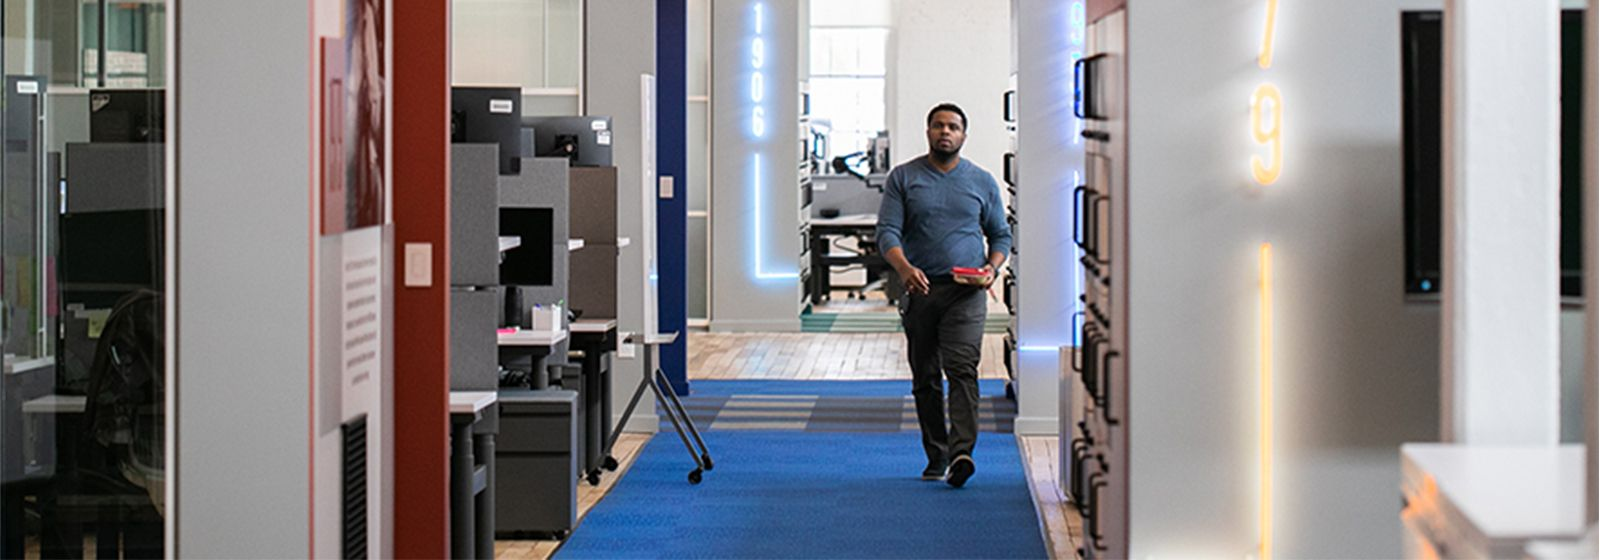 Duke Energy innovates for customers at Optimist Hall